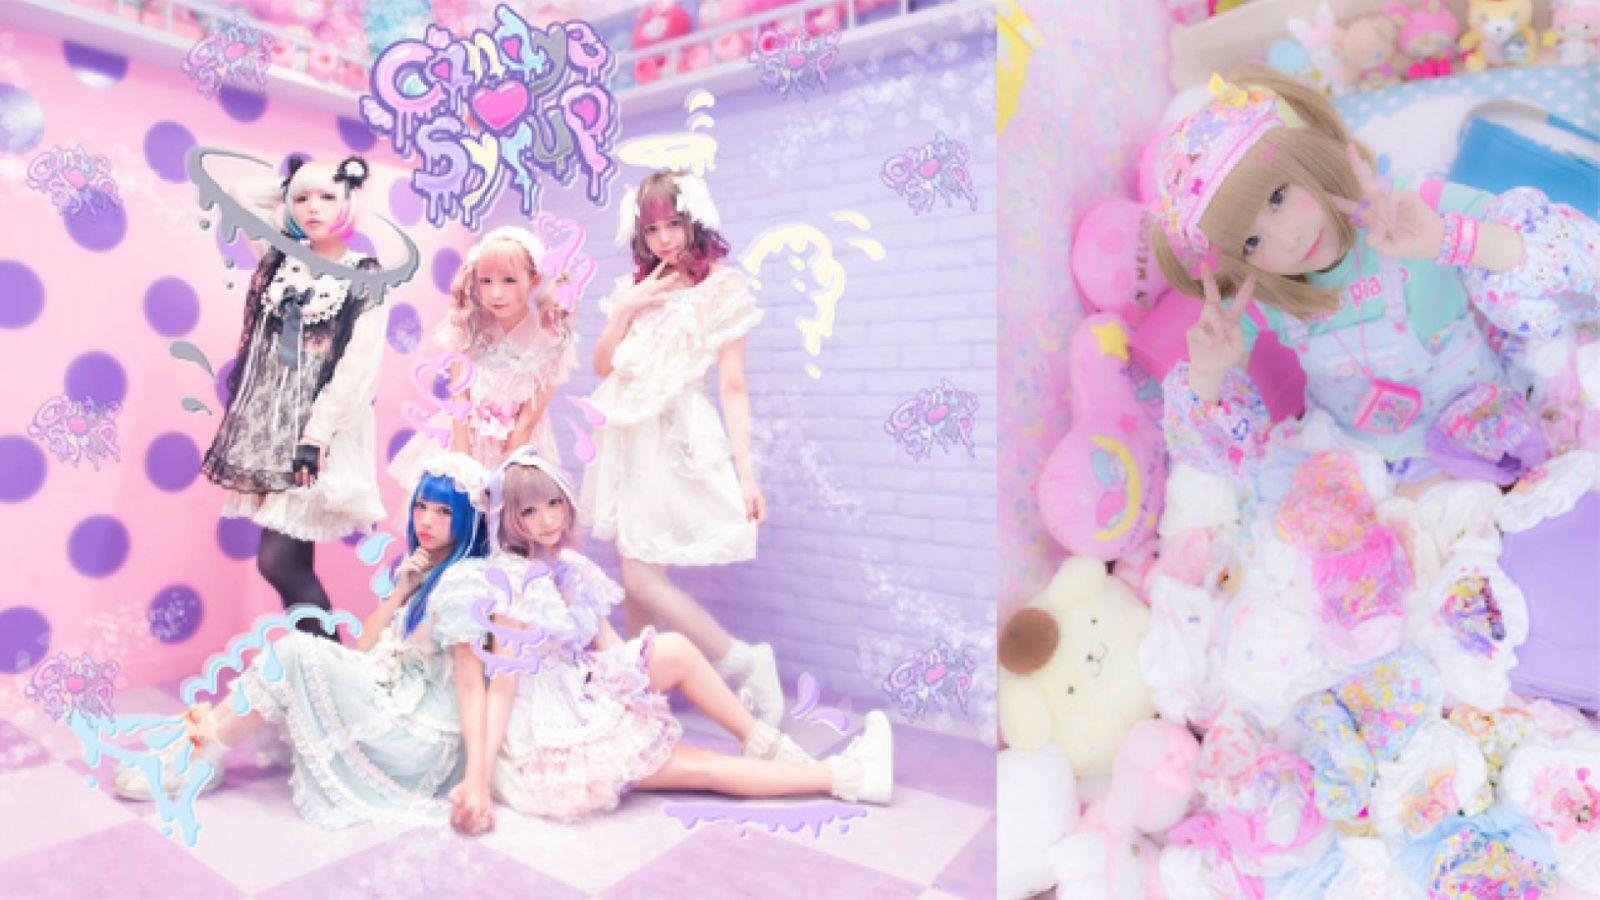 Candye♡Syrup and Senanan to Perform at Saboten Con © Starlit Signal Records